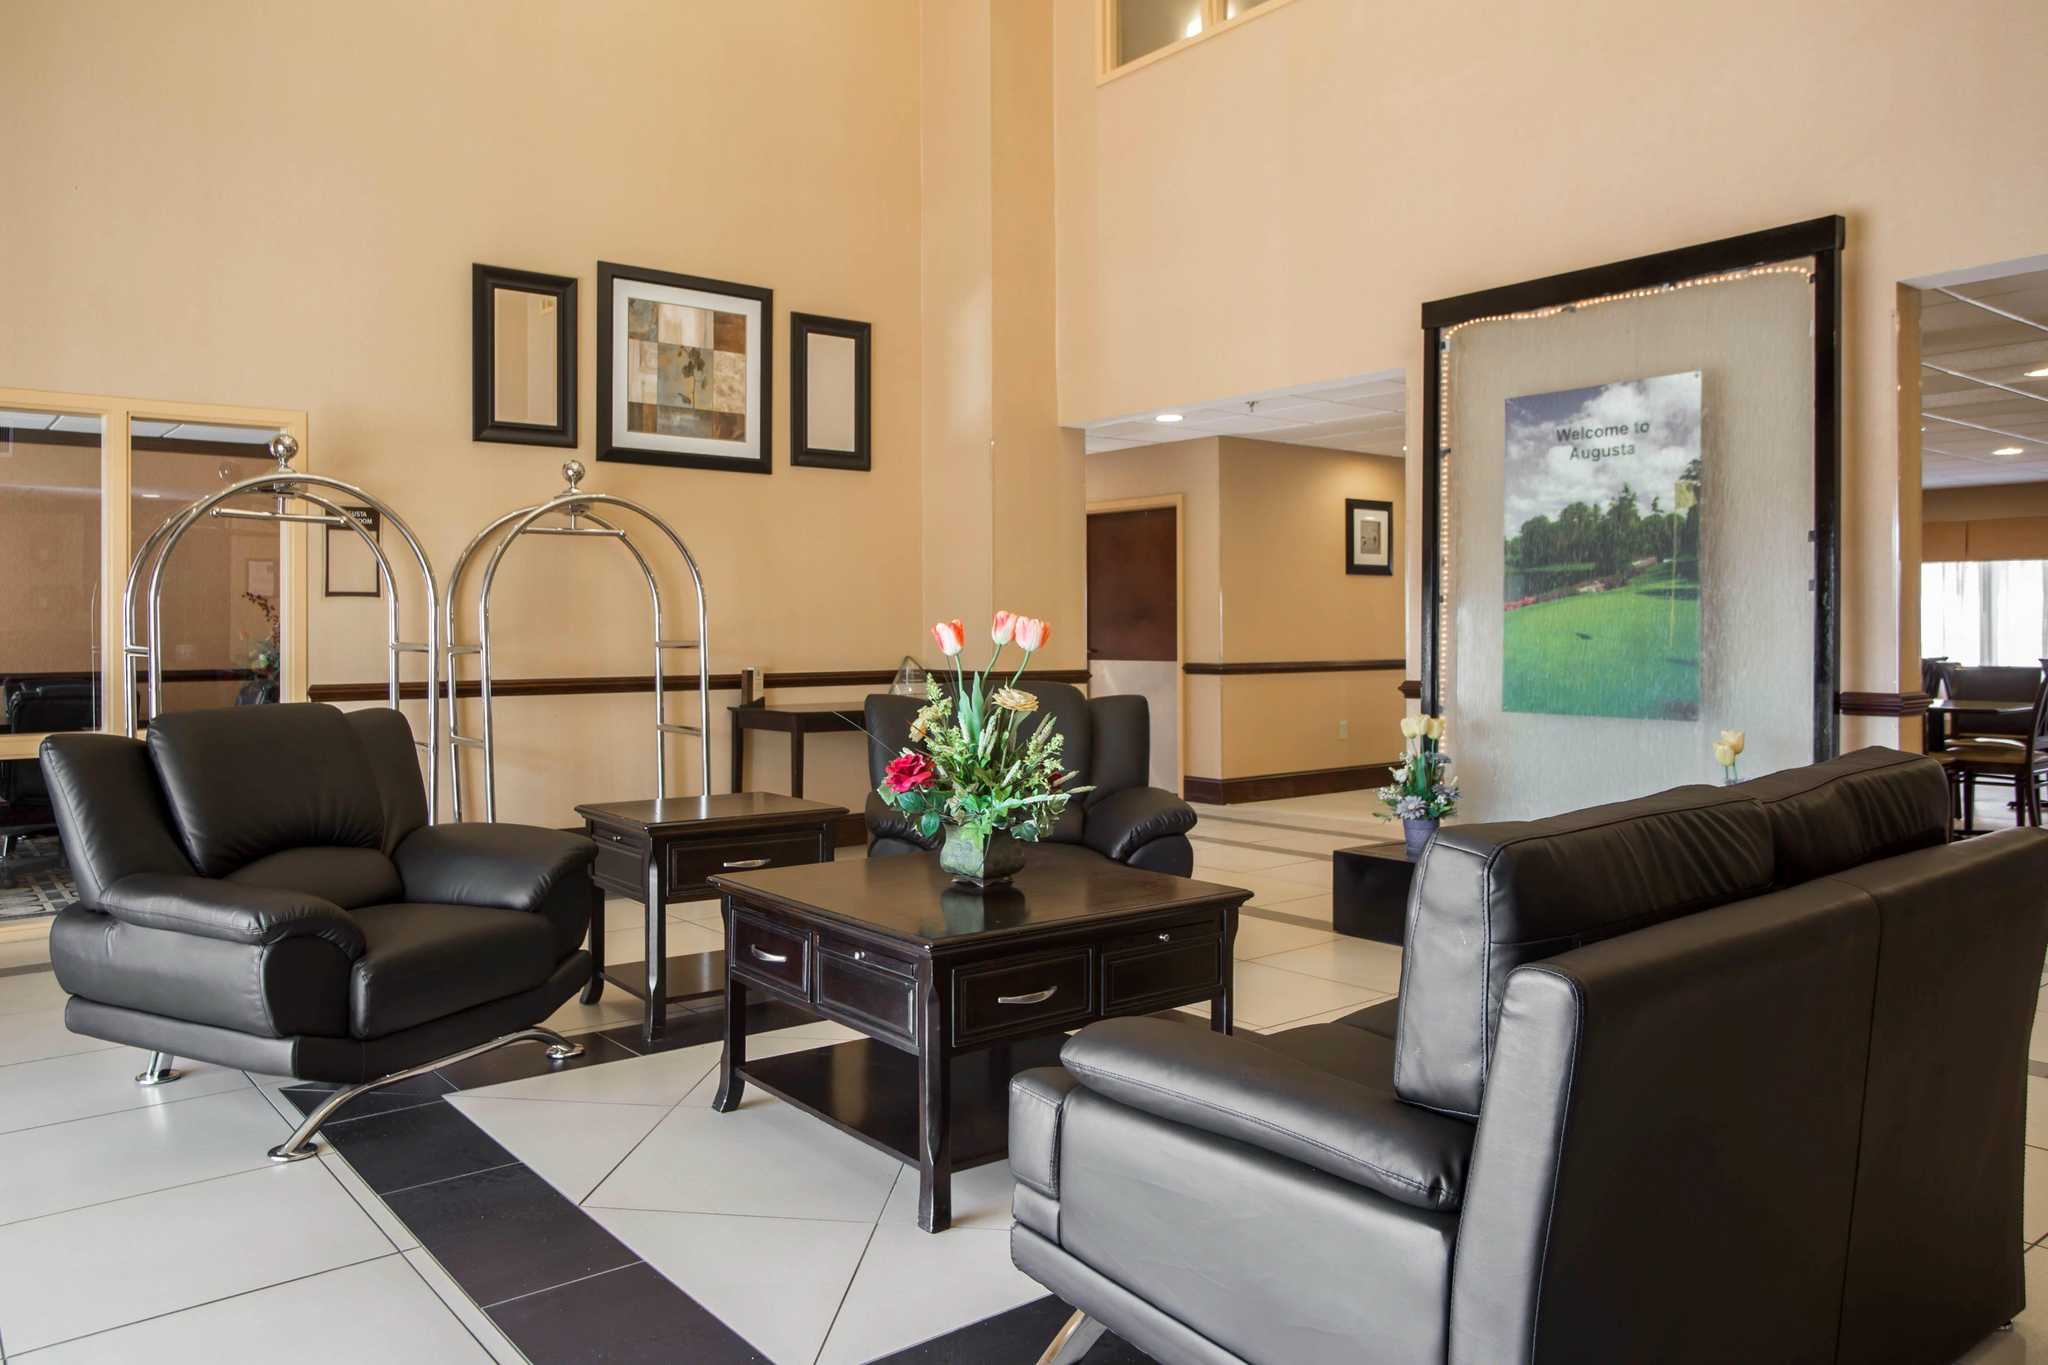 Comfort Inn Amp Suites Gordon Hwy Coupons Augusta Ga Near Me